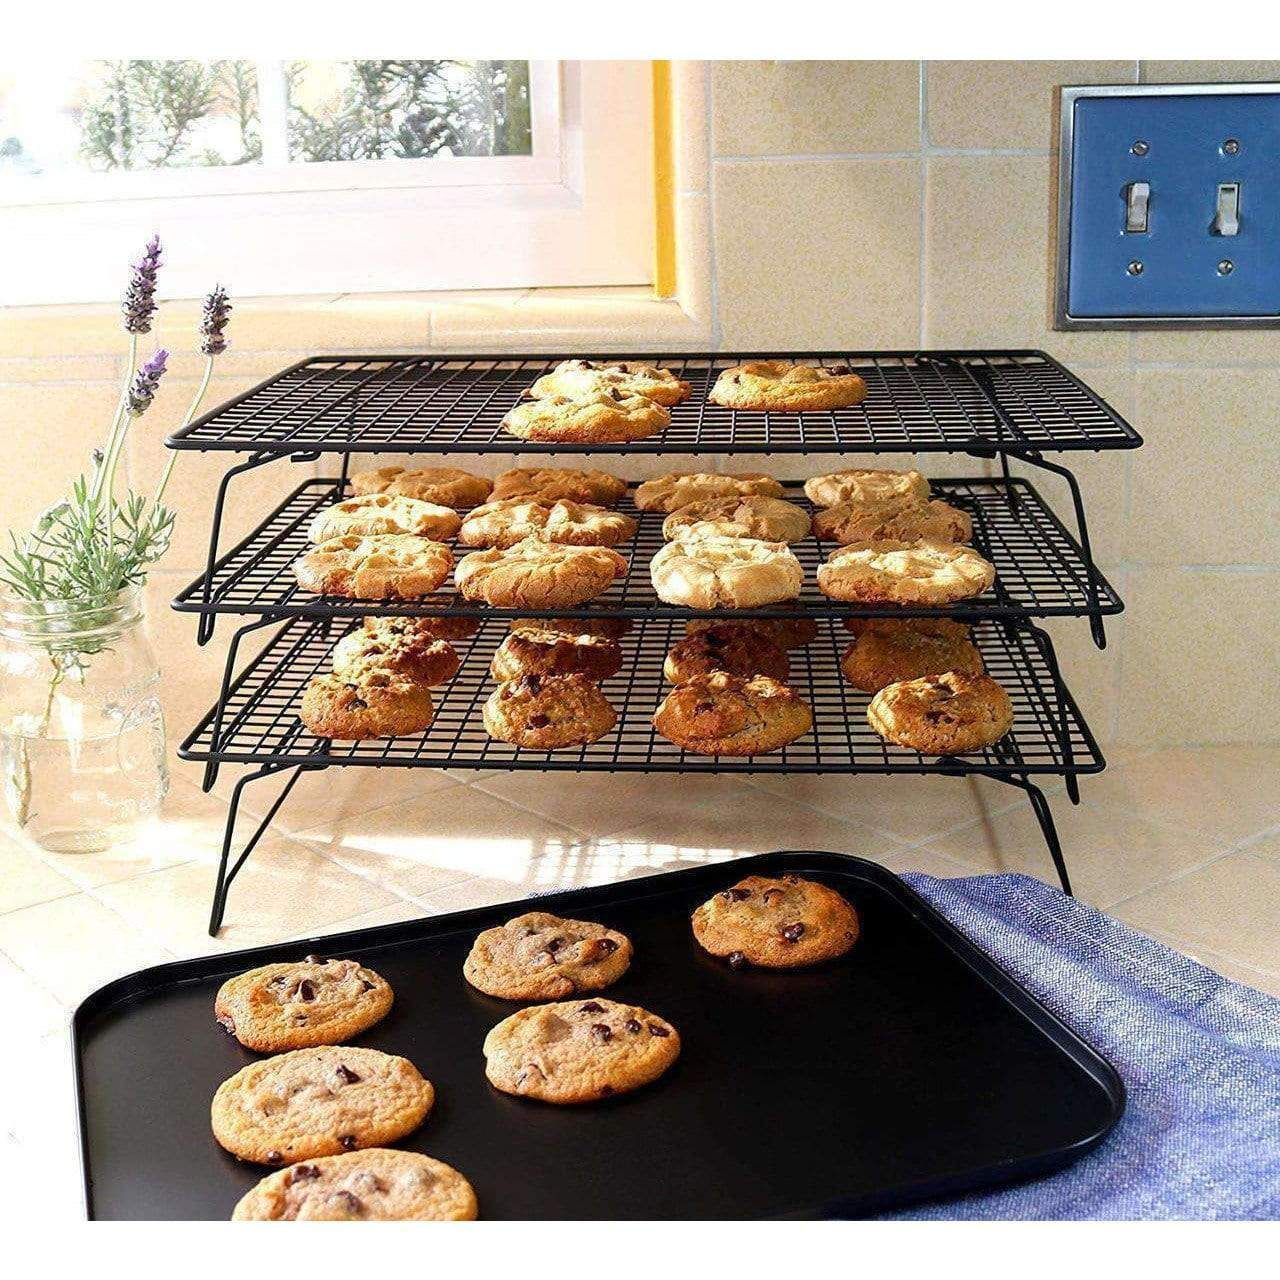 3 Tier Baking Cooling Rack Cooling Racks Air Fryer Oven Recipes Baking